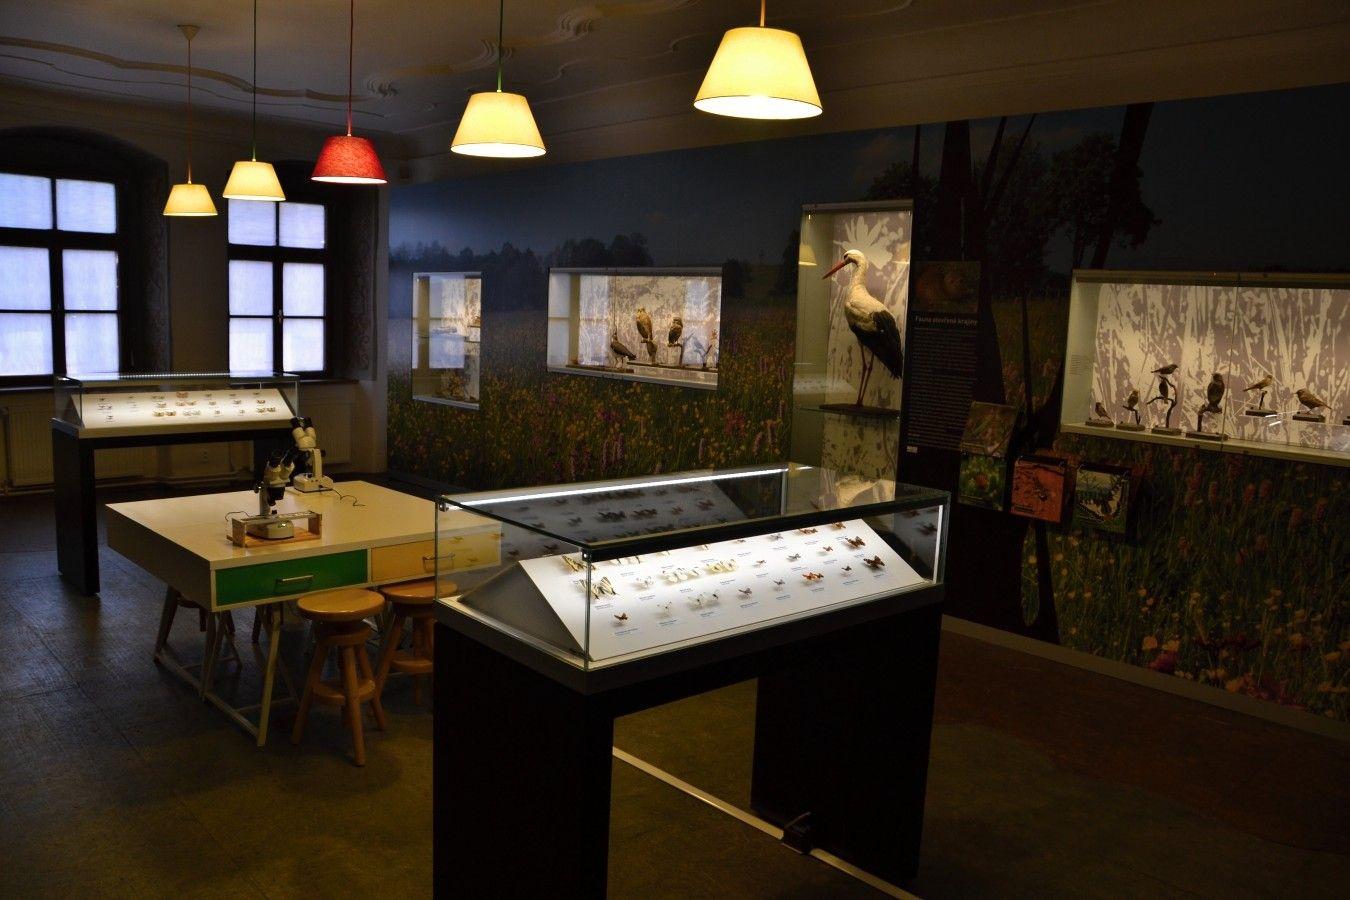 muzeum-vysociny-jihlava-otevrena-krajina